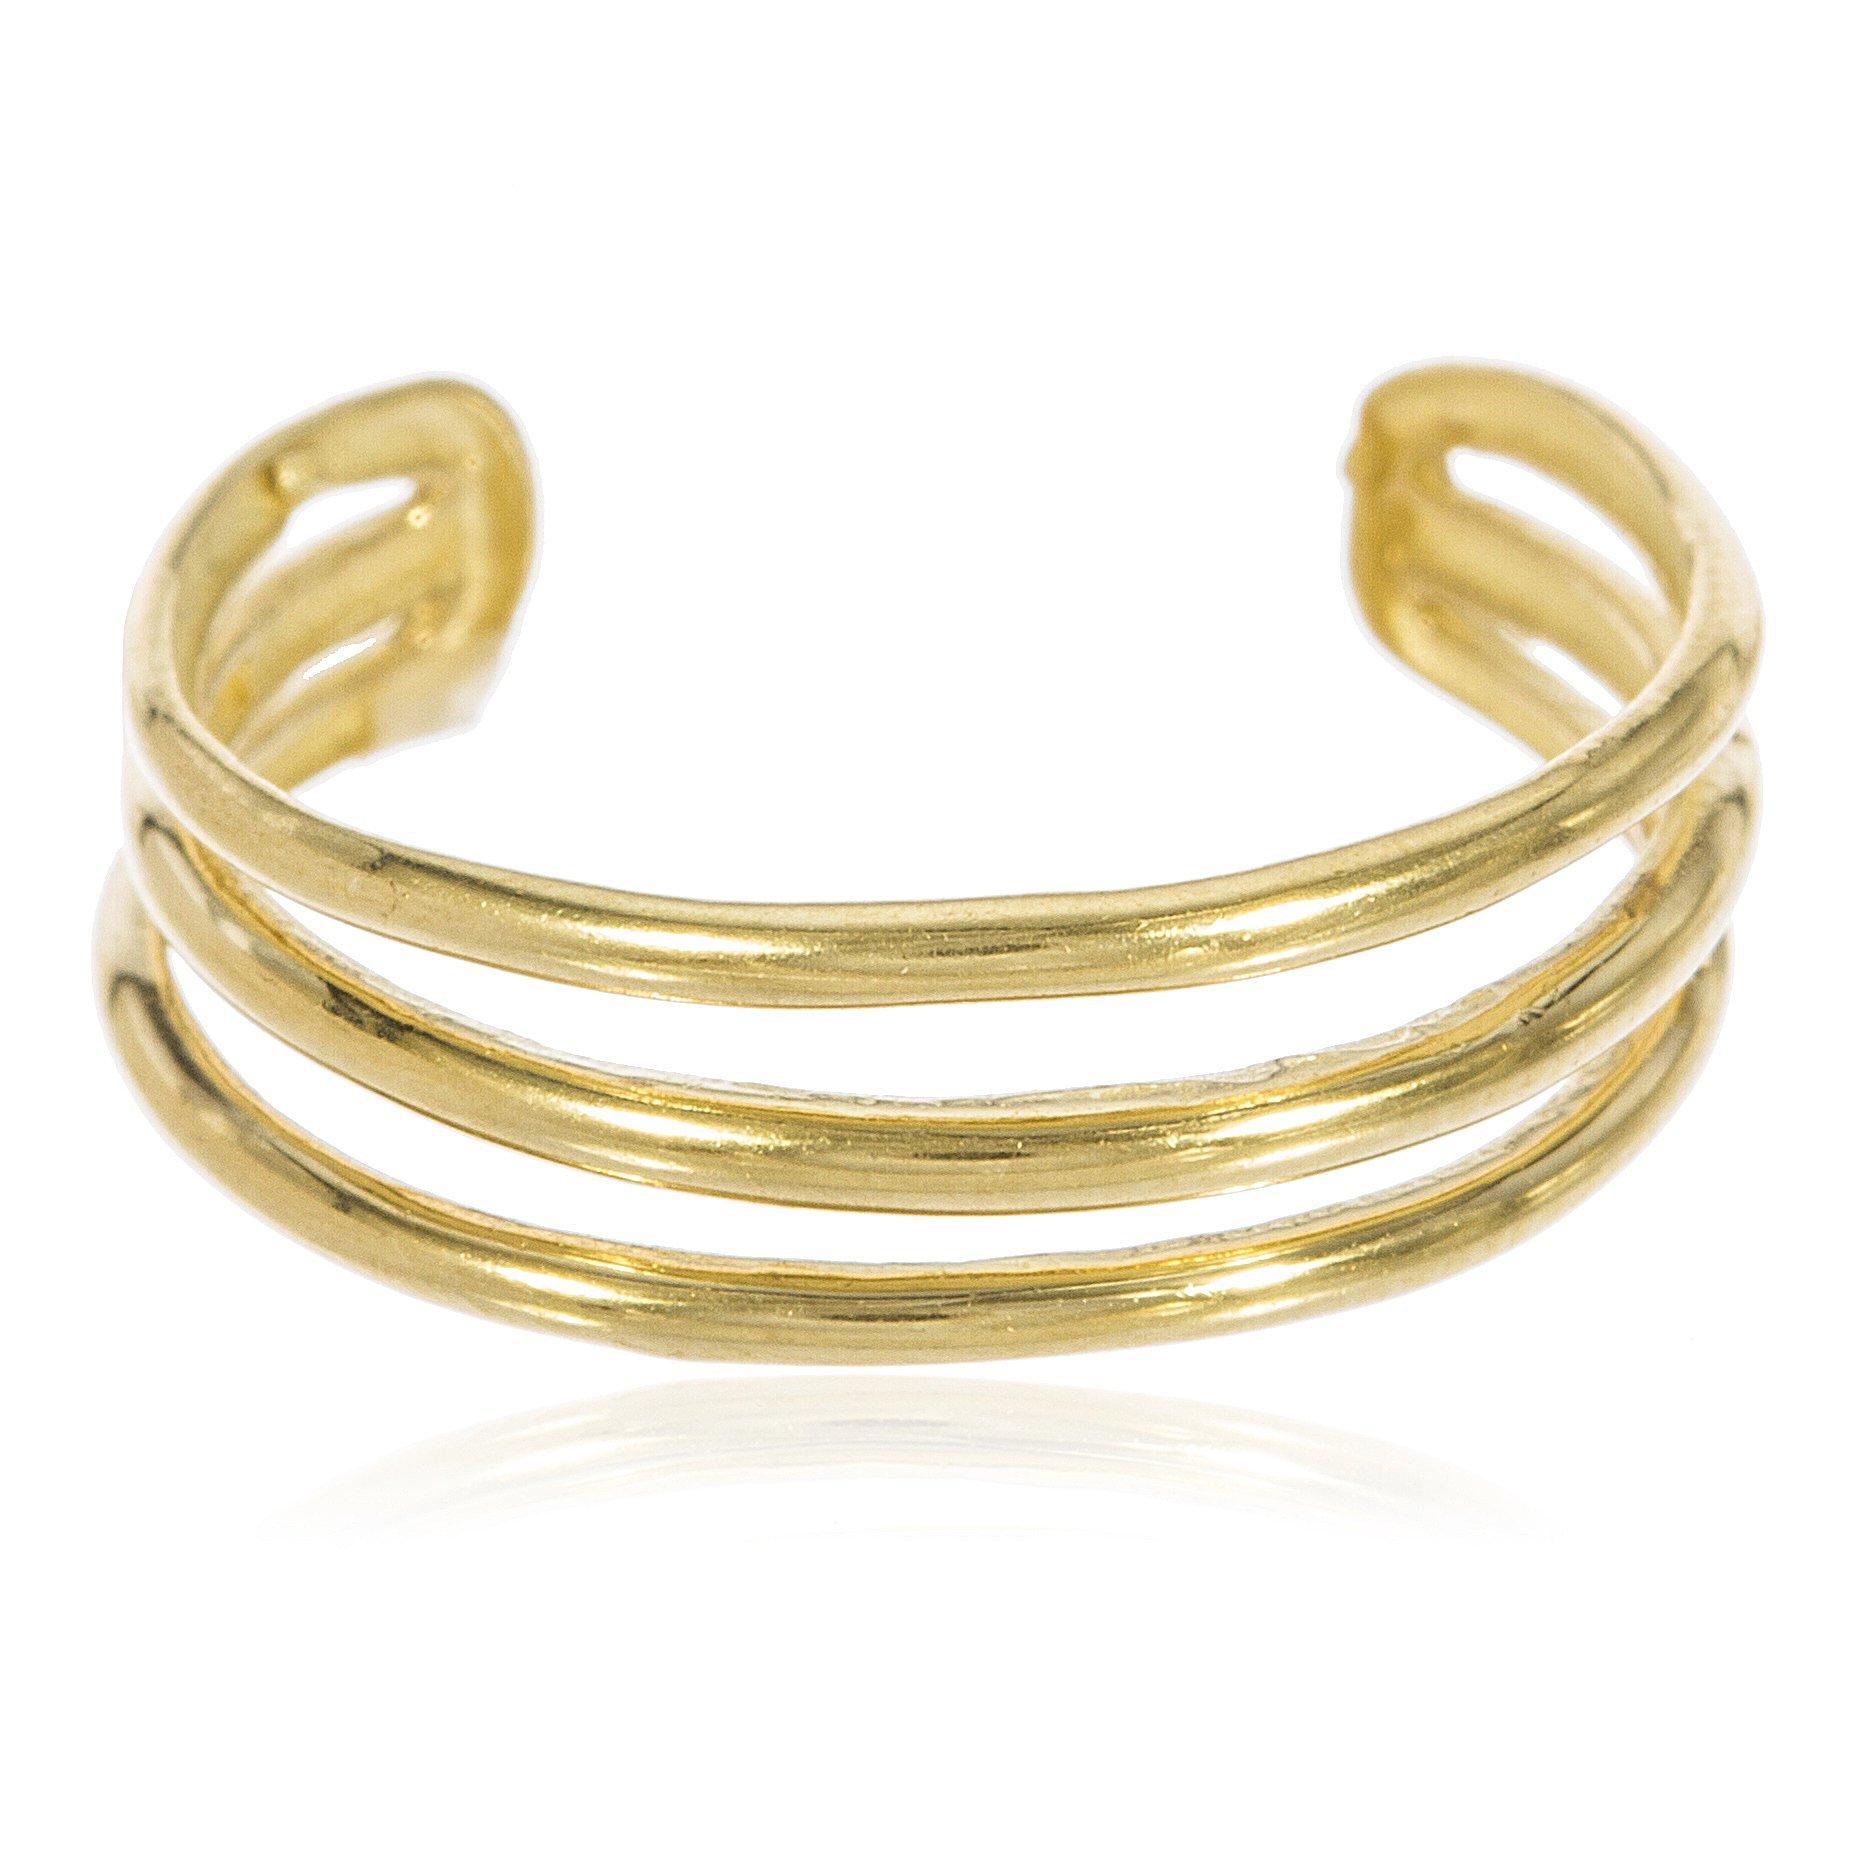 JOTW 14k Yellow Gold Three Wire Toe Ring (GO-1024) by JOTW